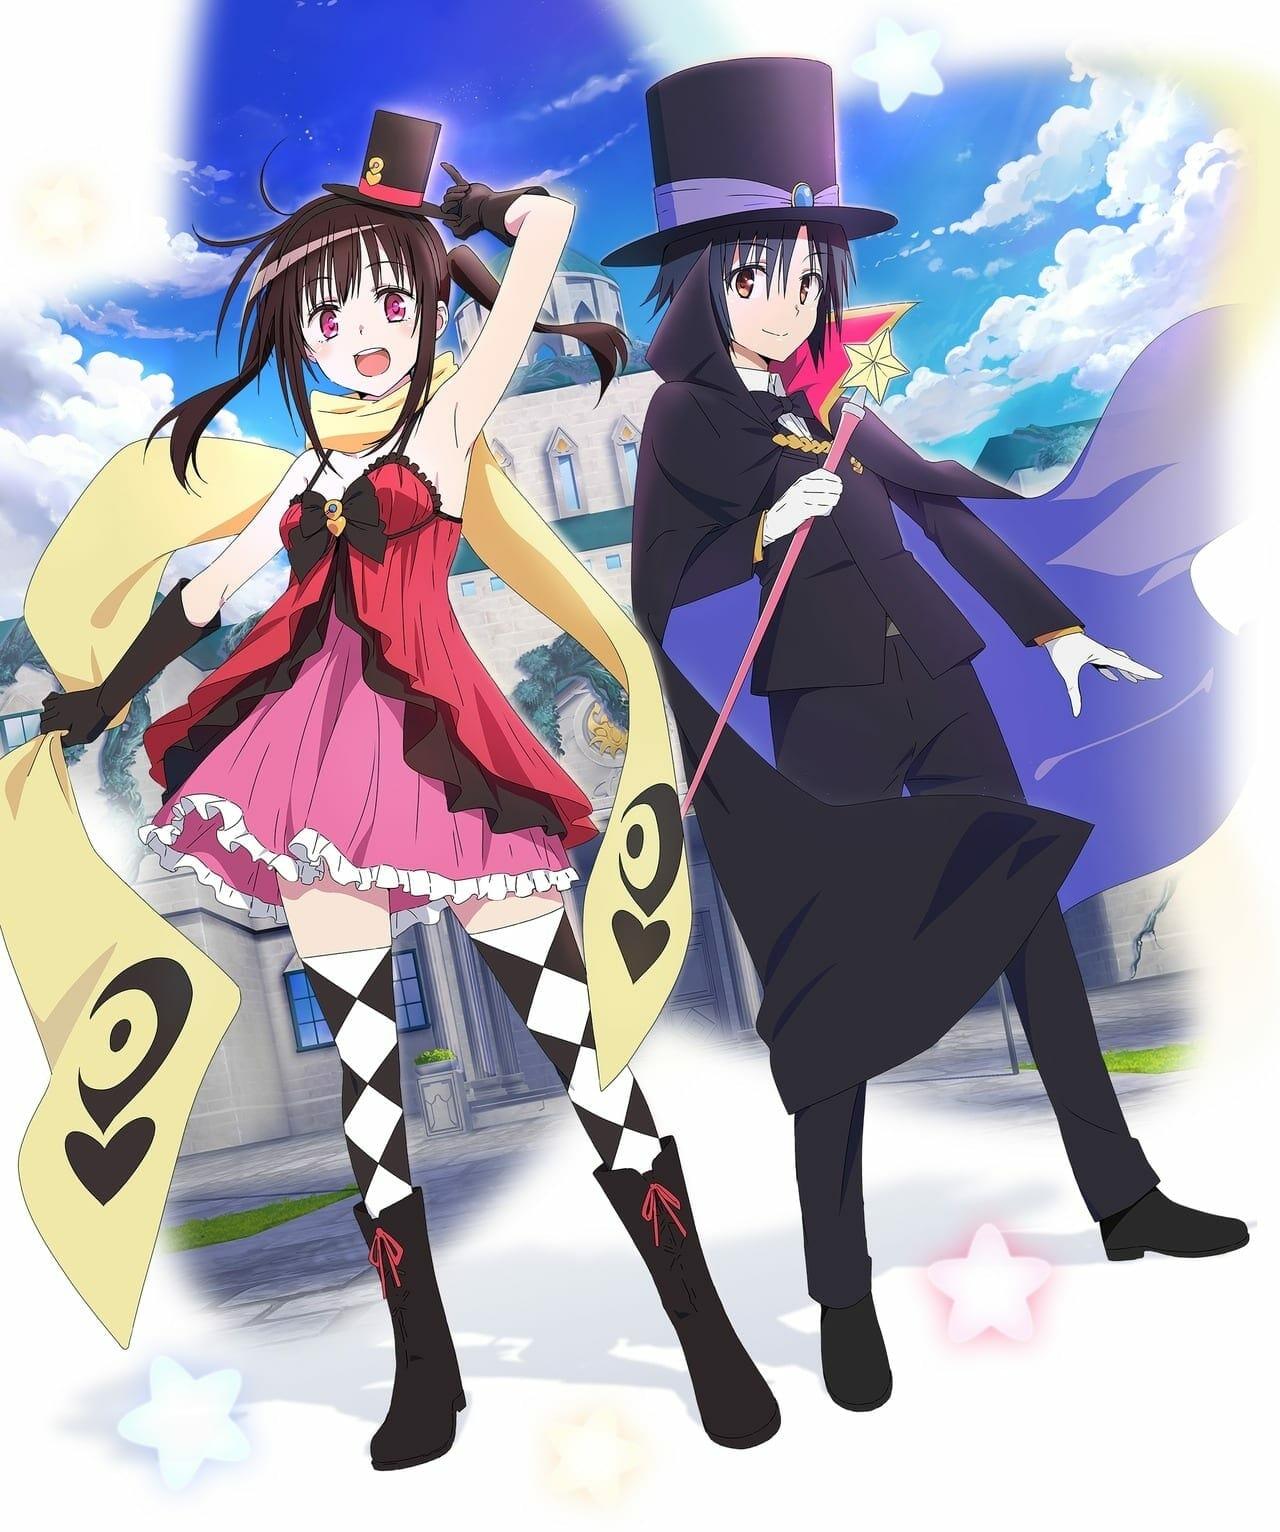 Hatena☆Illusion key visual - A New Key Visual for Hatena☆Illusion Anime Released